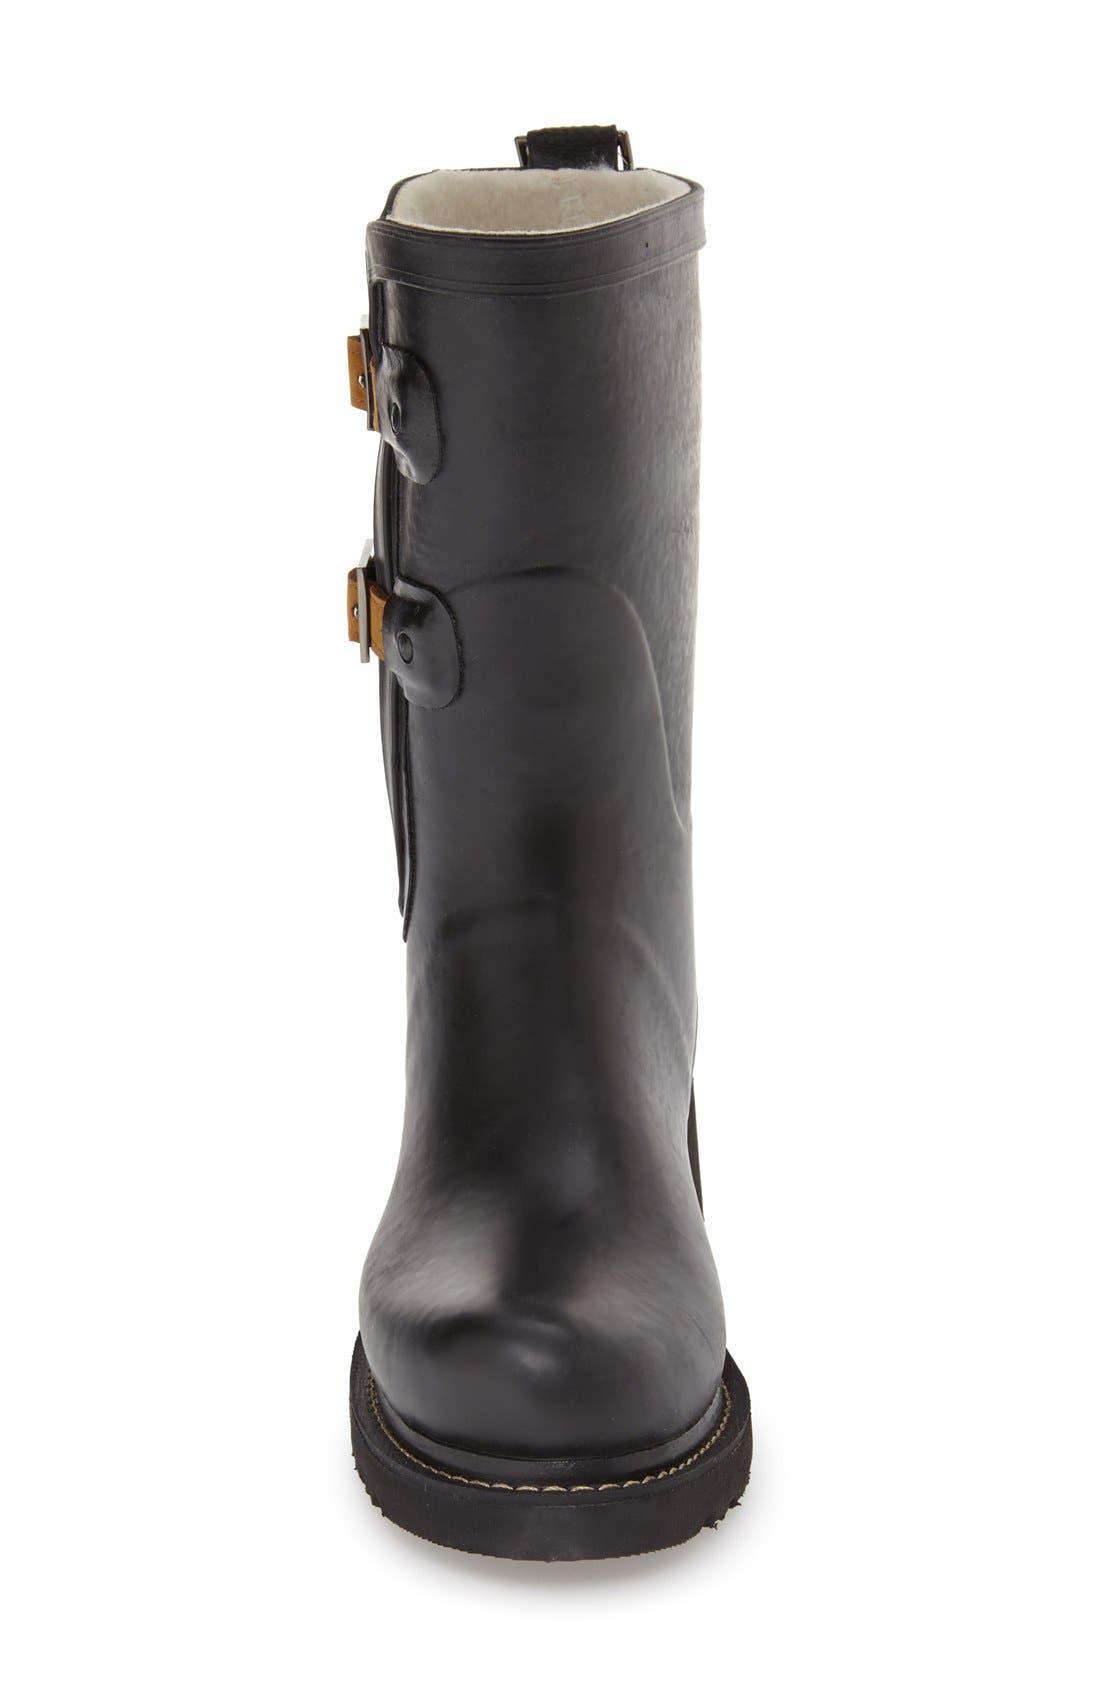 Waterproof Buckle Detail Snow/Rain Boot,                             Alternate thumbnail 3, color,                             BLACK